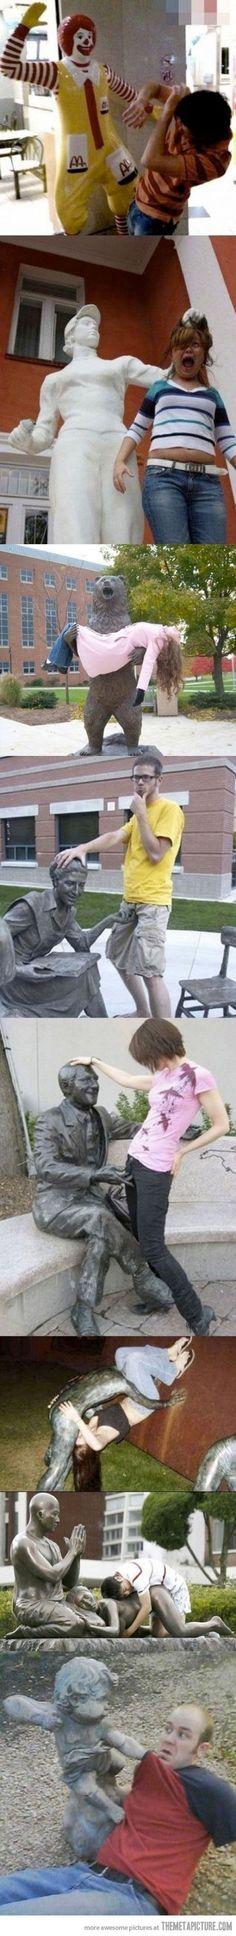 cheeky lecherous statues